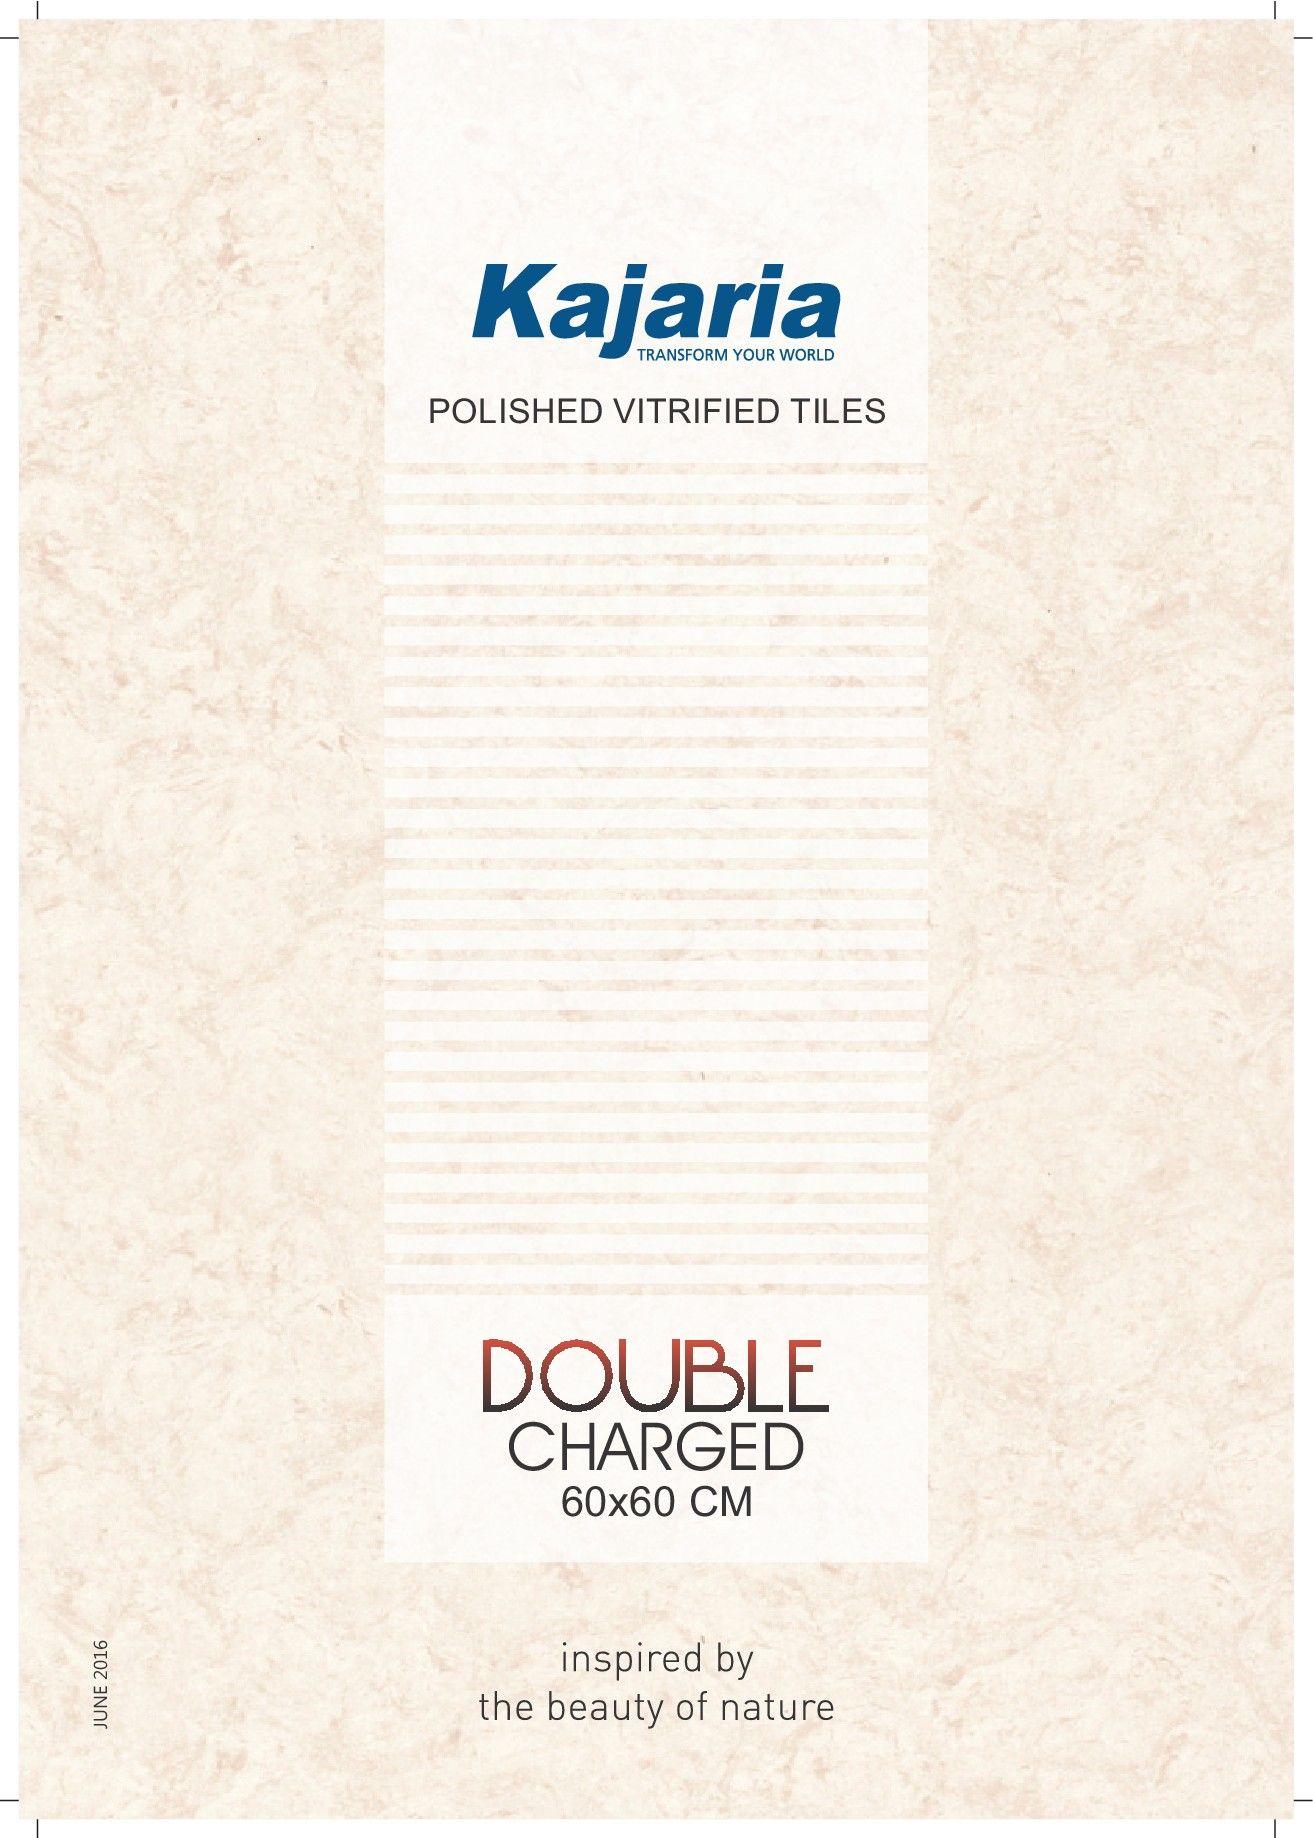 Let S Explore The Product Catalogues Catalogs Of Kajaria Ceramics Type Ceramic Vitrified Glazed Vitrified At Wizbox Which Expl Vitrified Tiles Tiles Catalog